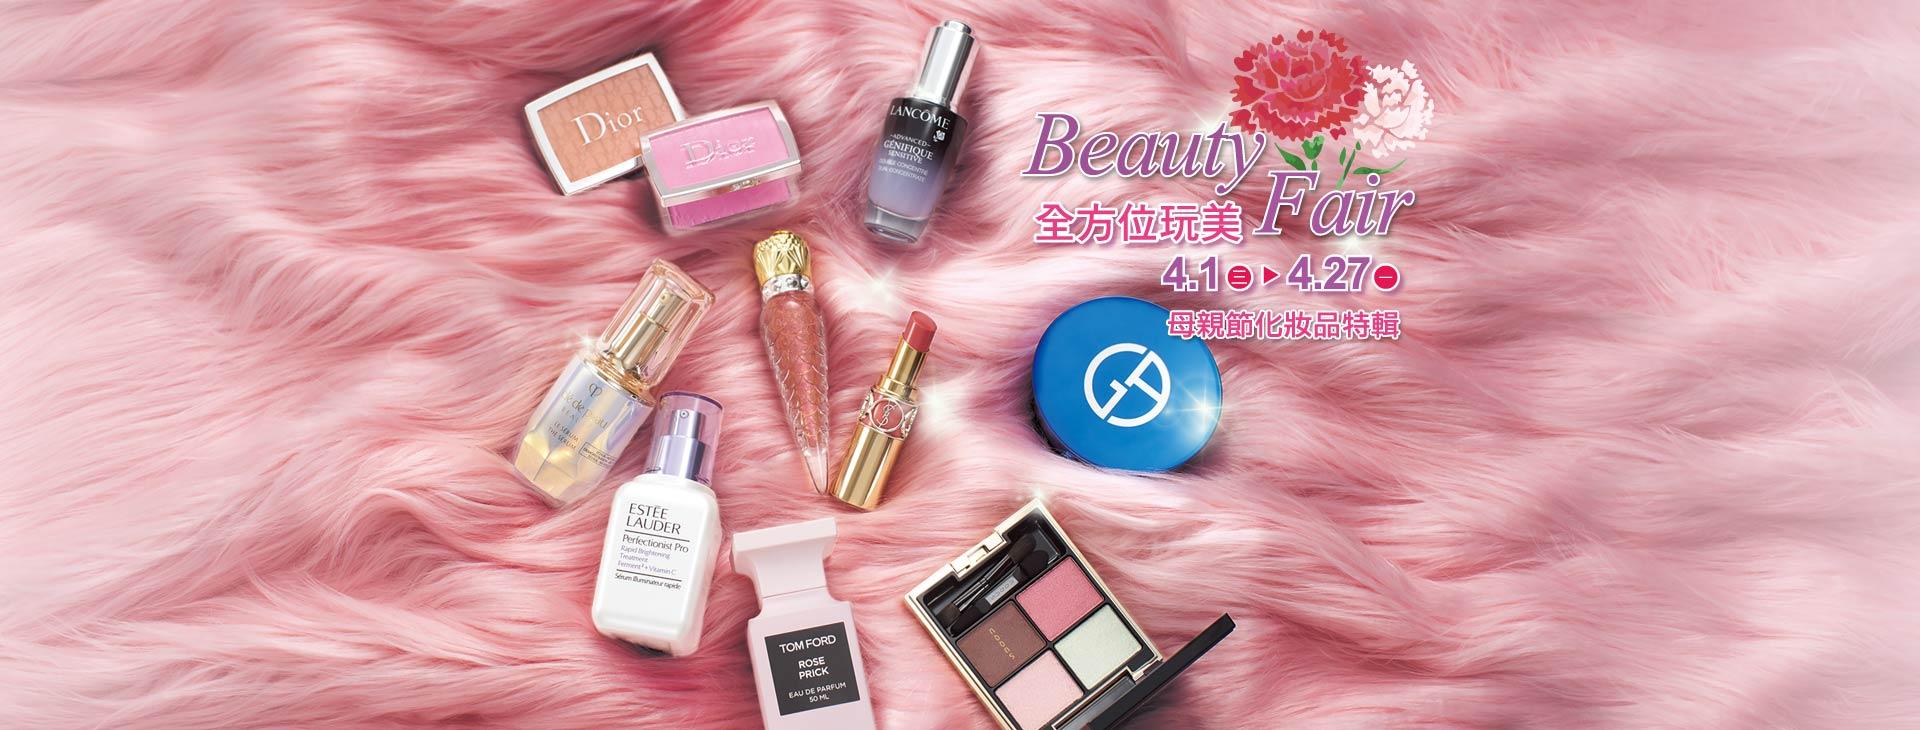 Beauty Fair全方位玩美~母親節化妝品專刊